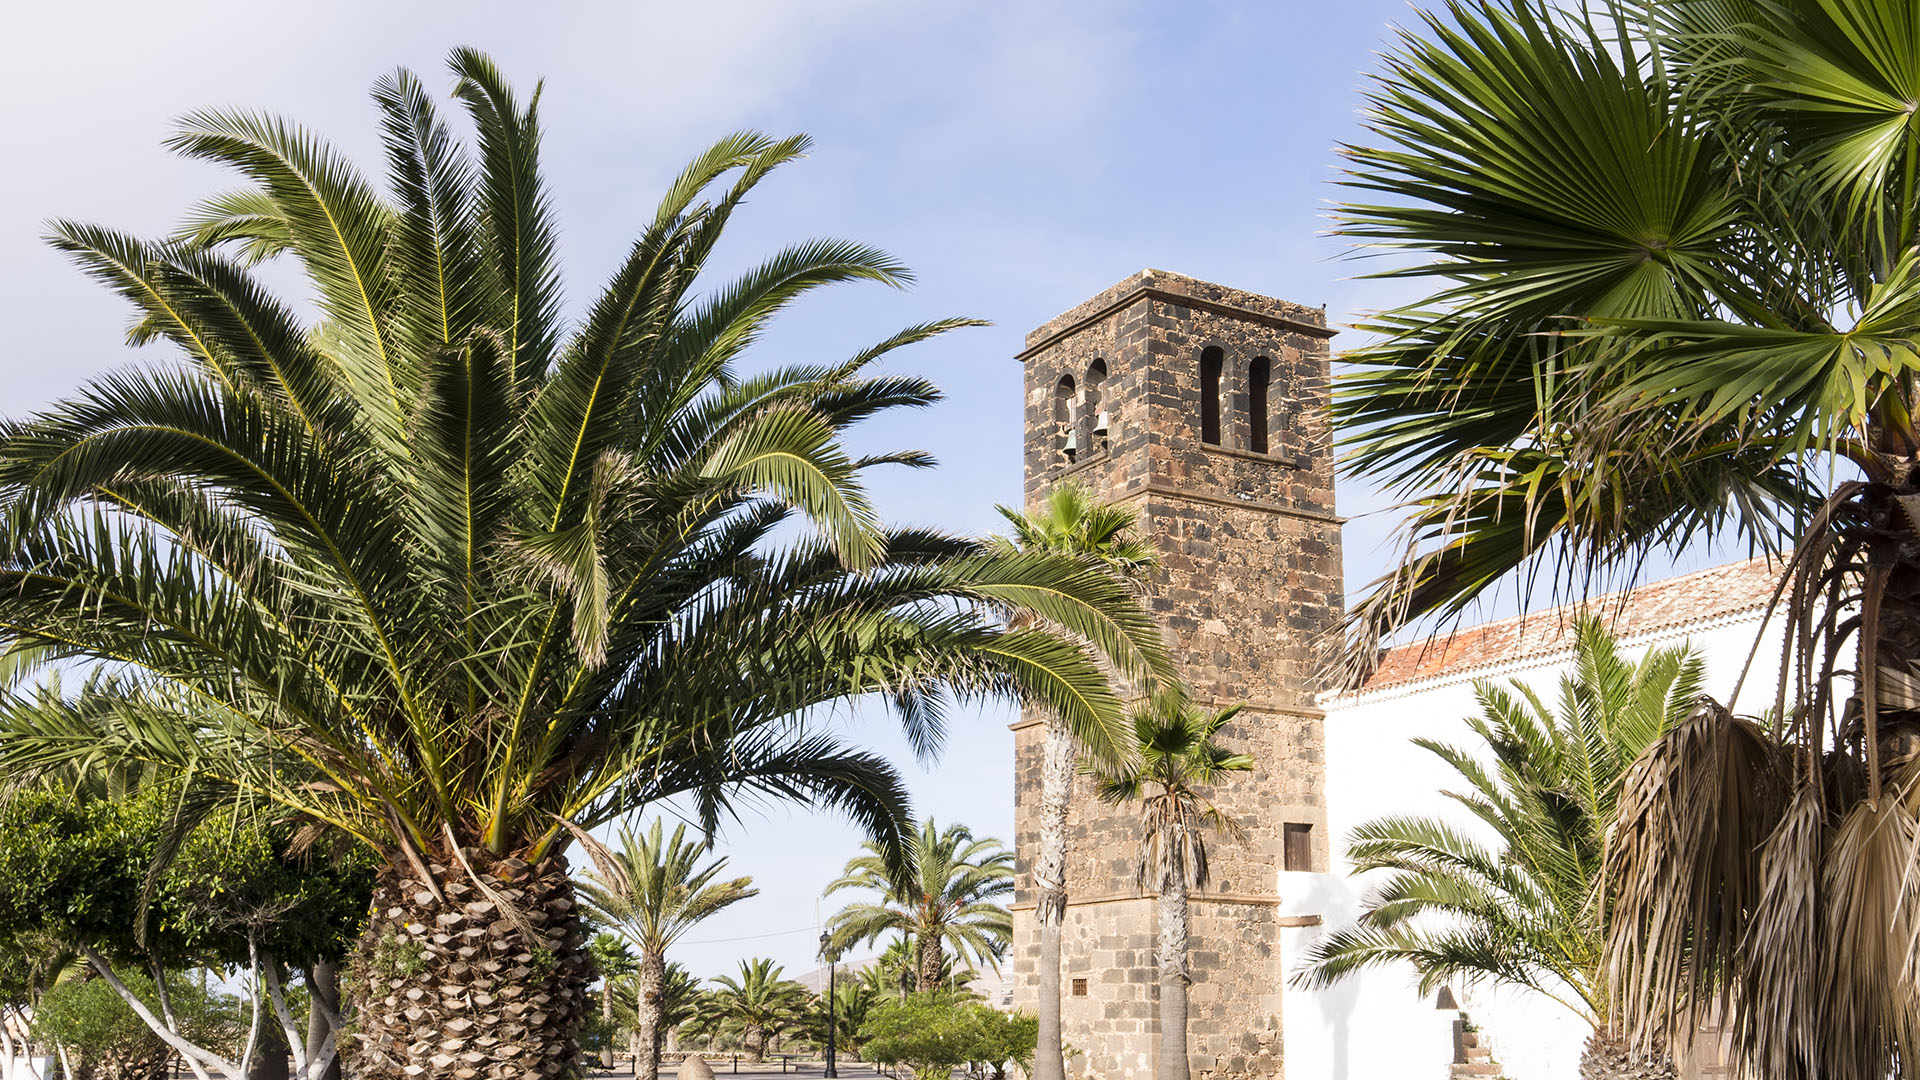 Fiestas + Wallfahrten auf Fuerteventura: Fiesta de las Candelas La Oliva.